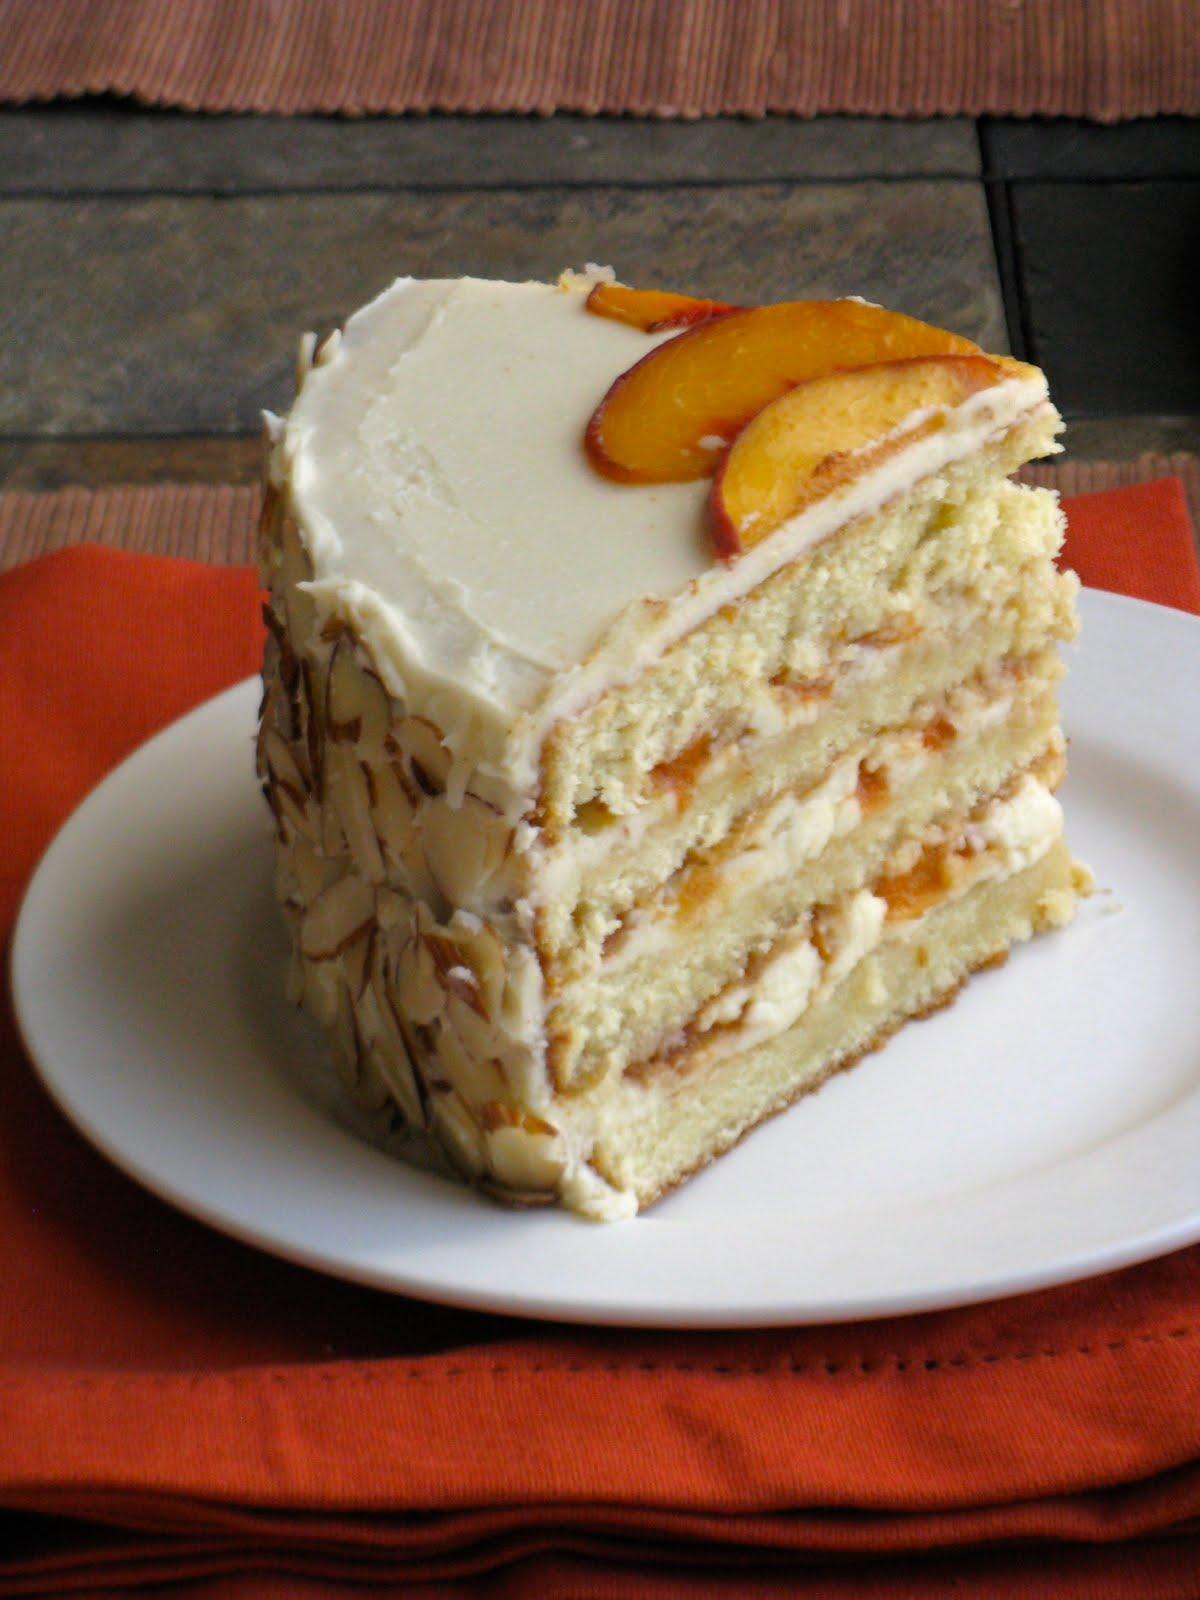 Apricot Buttercream Frosting Recipe